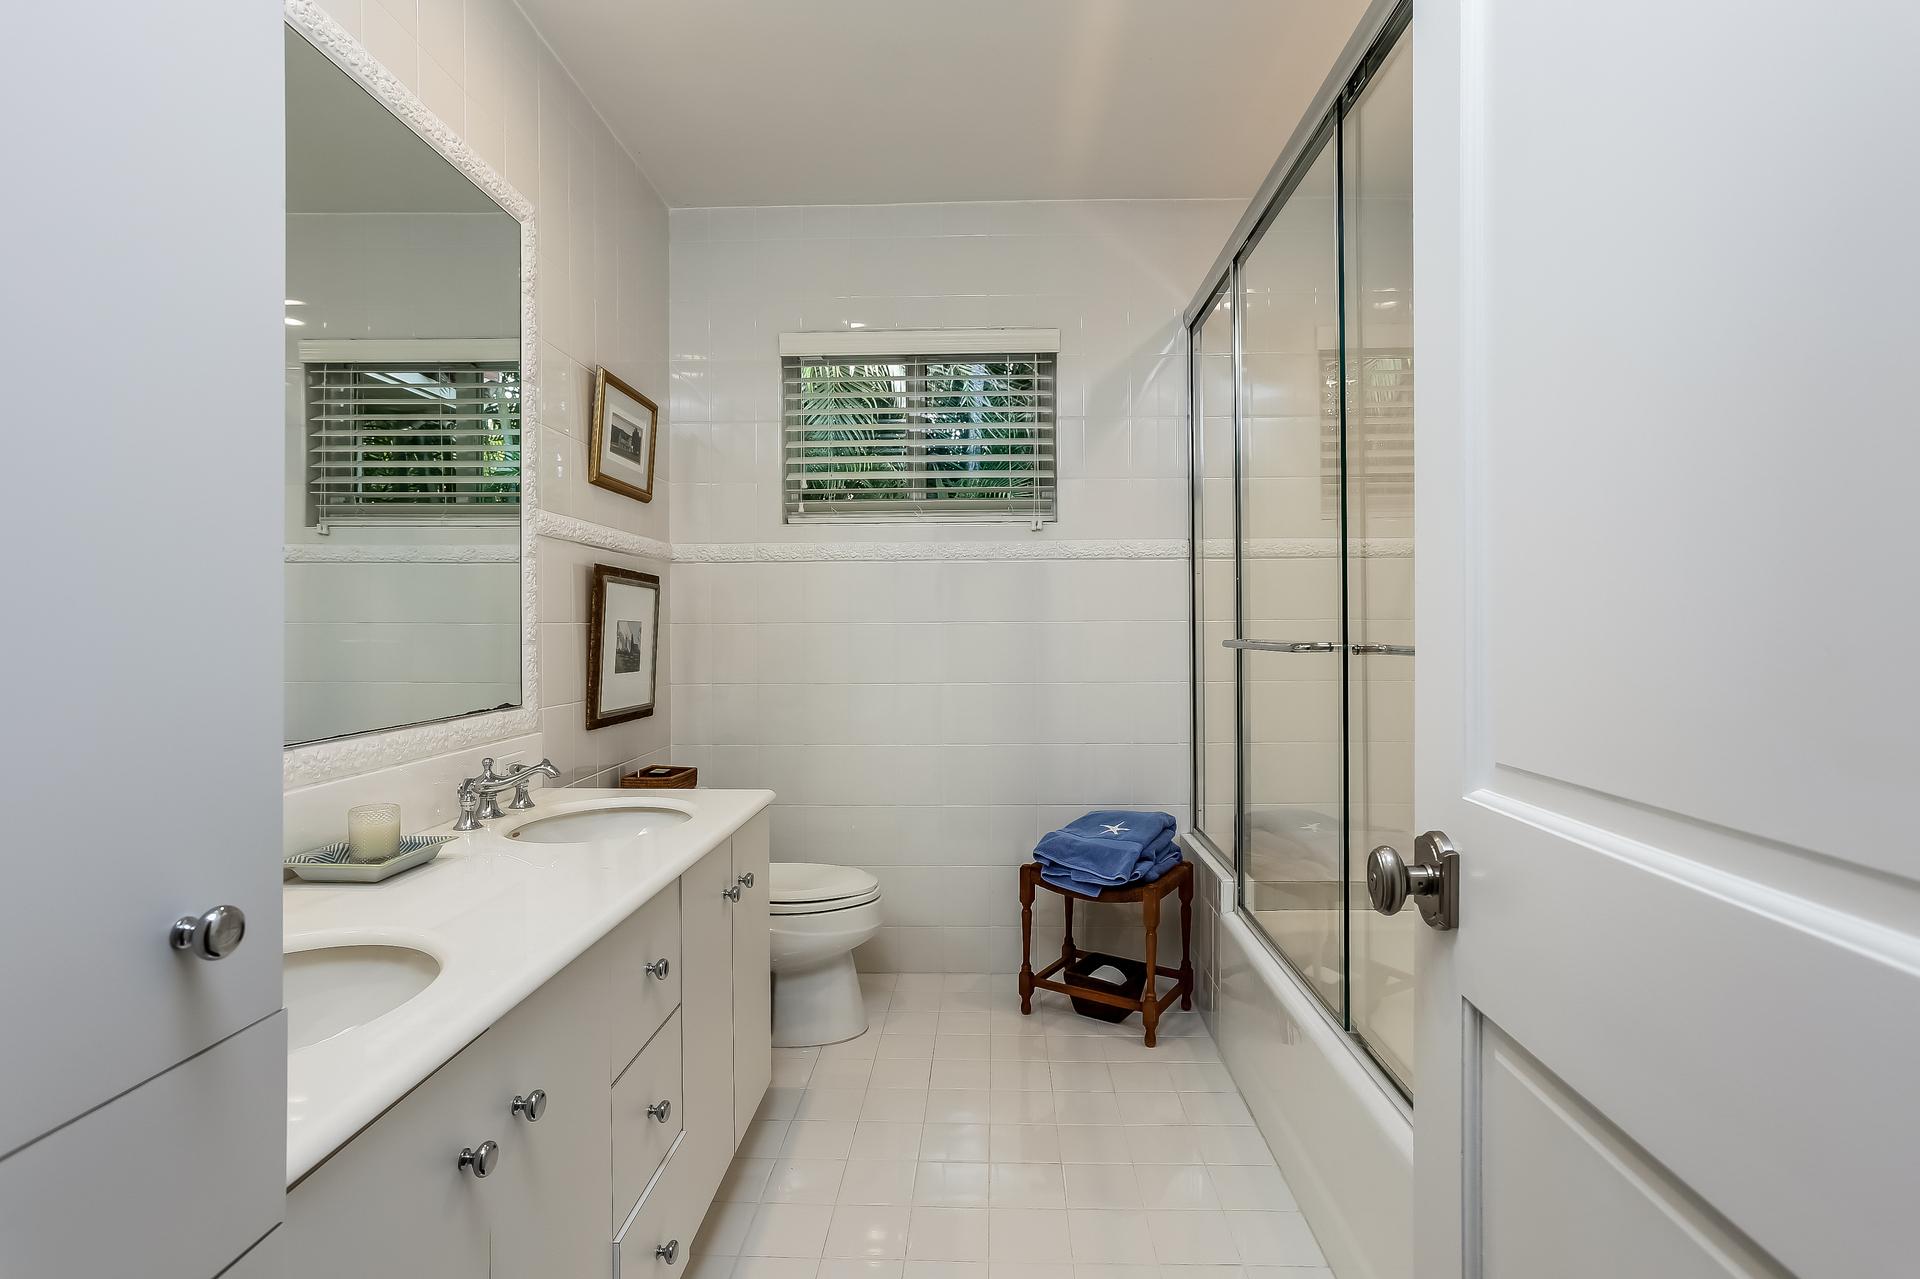 032-Bathroom-2647592-medium.jpg